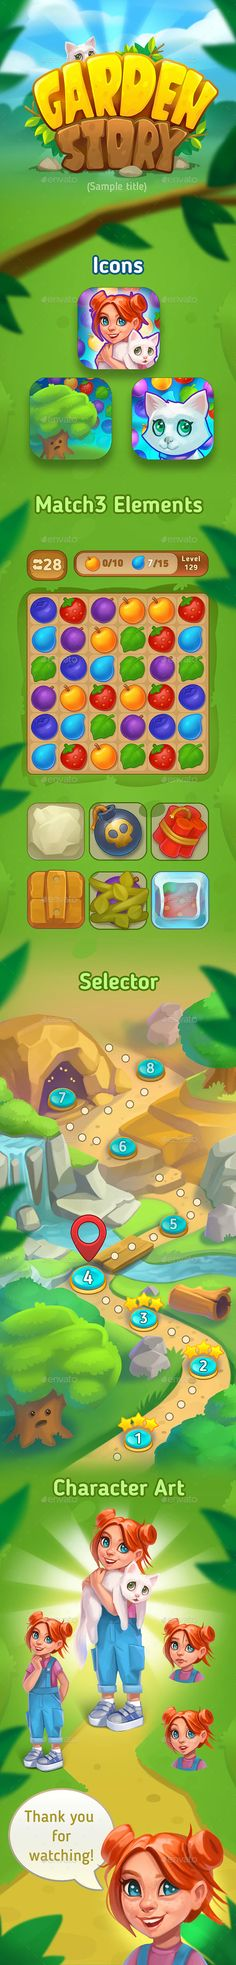 Match3 Game Art Assets by nadya_ko | GraphicRiver Application Icon, Game Icon, Game Assets, Game Logo, Marketing Materials, Kittens Cutest, Game Art, Logo Design, Concept